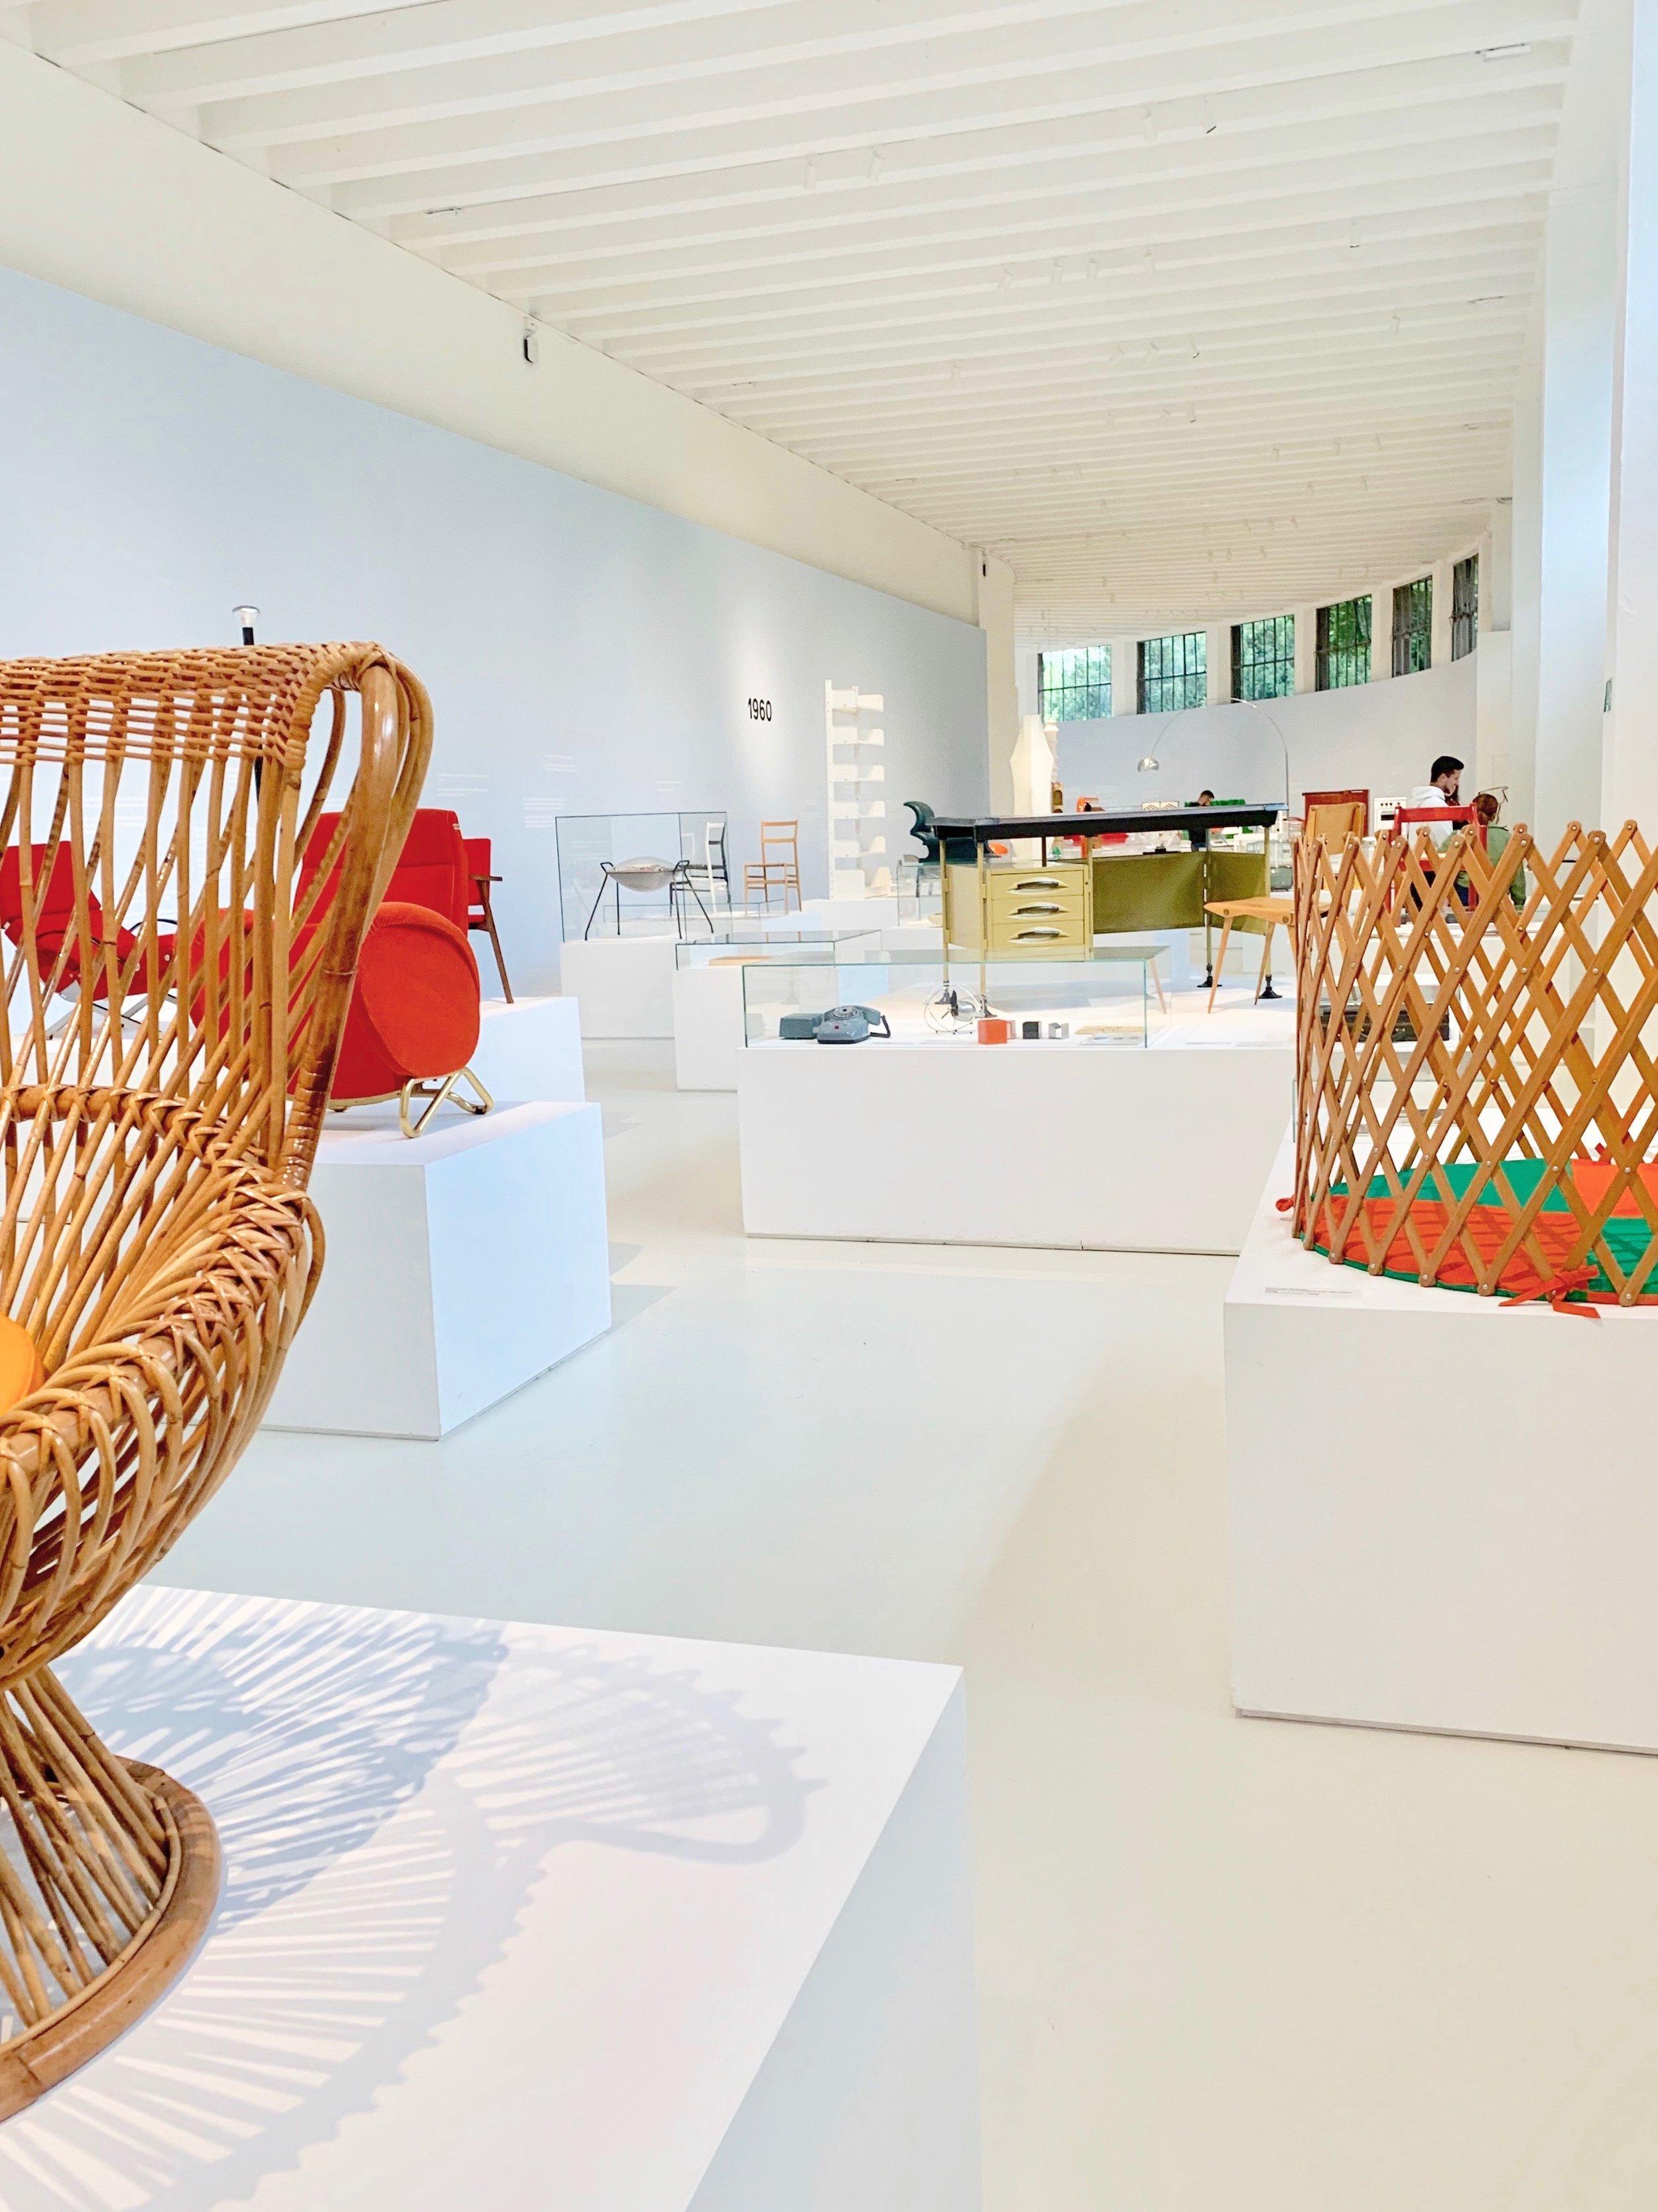 Museum Of Italian Design - Italian Mid Century Modern Furniture Designitalia00006.jpeg